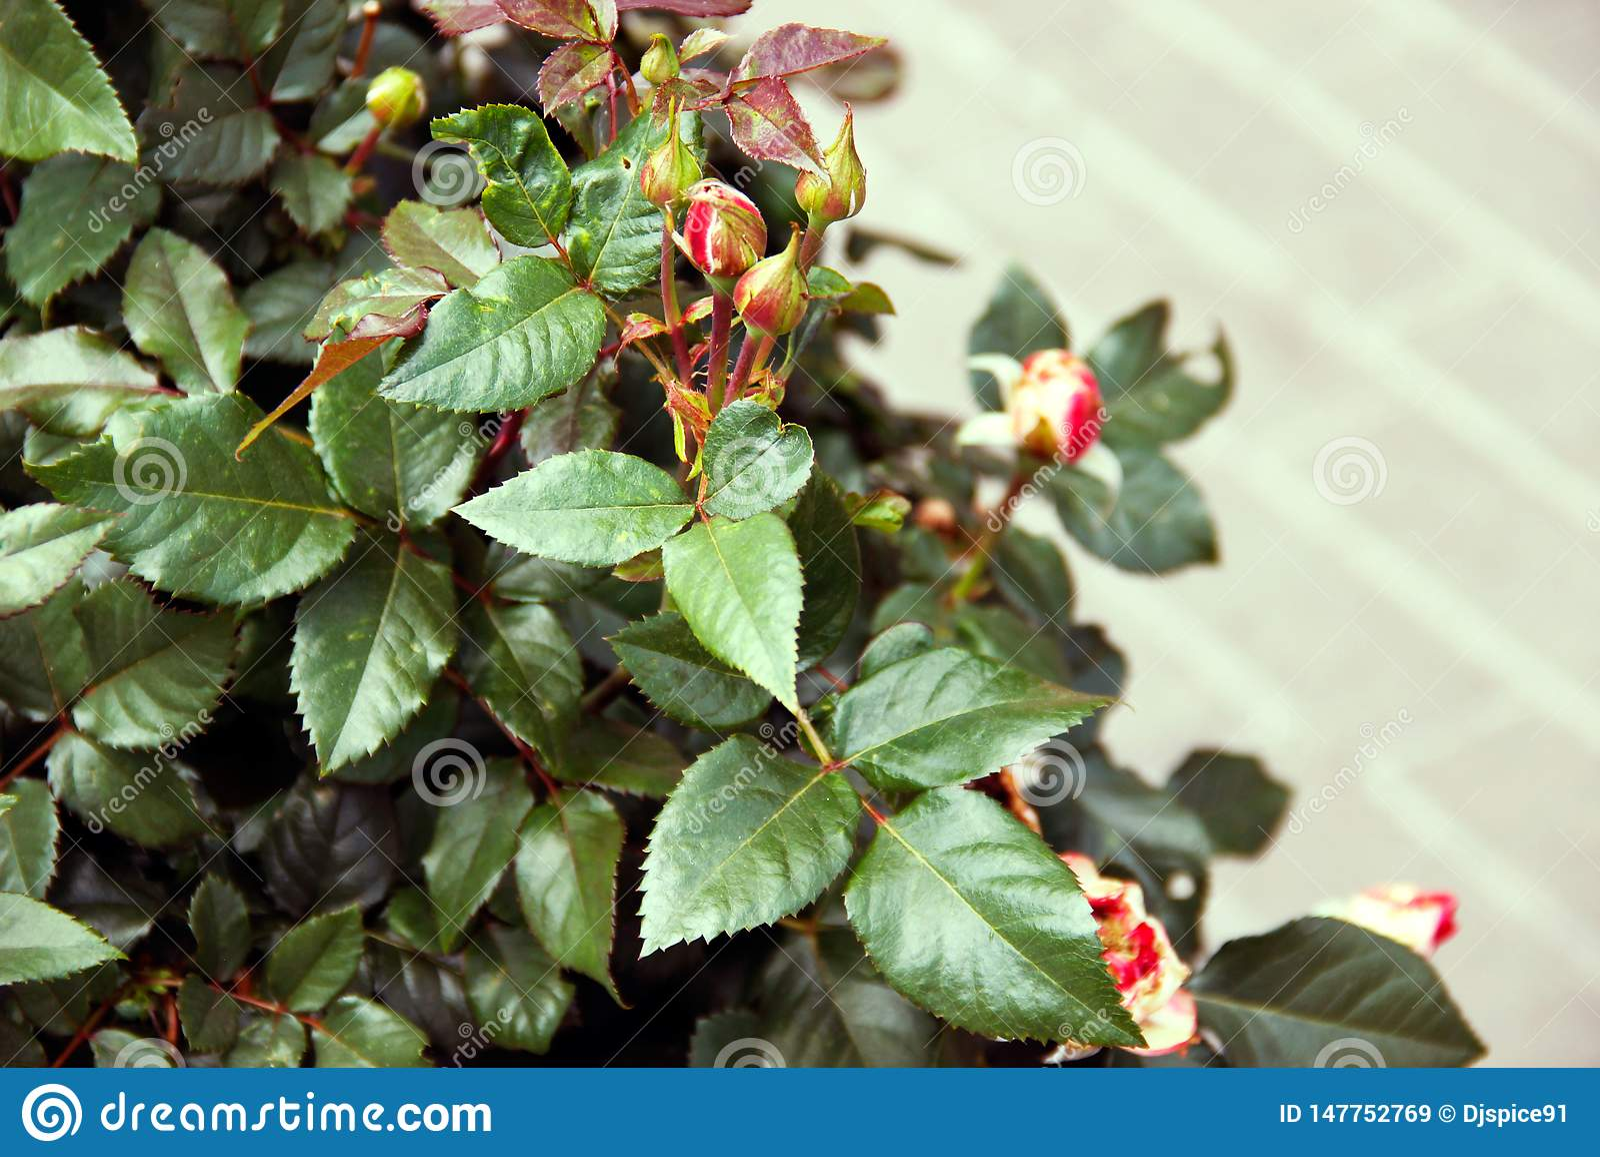 Unopened rosebud on a Bush